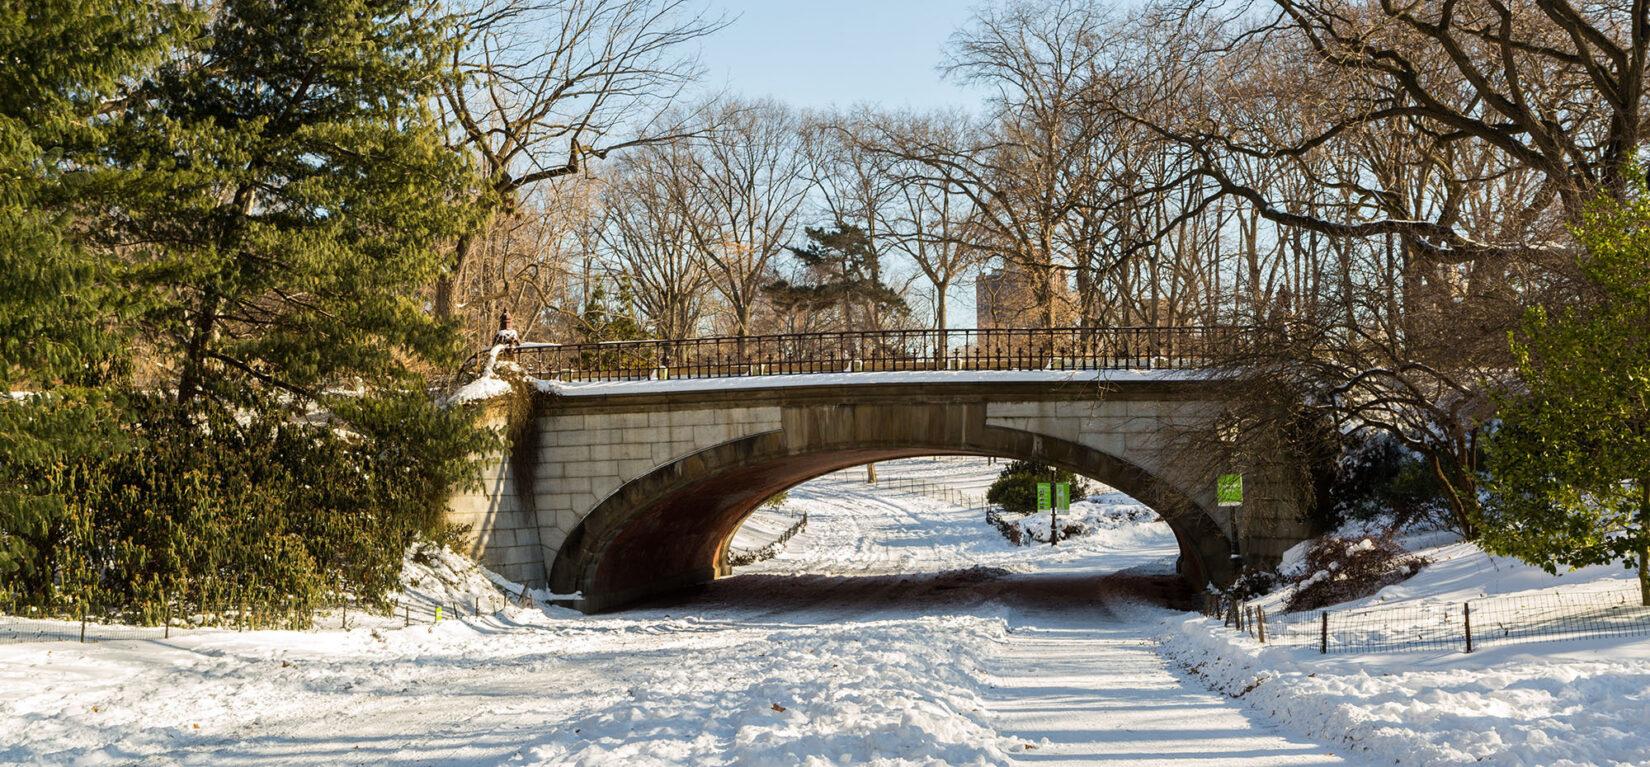 Winterdale Arch Snow January 2018 0002